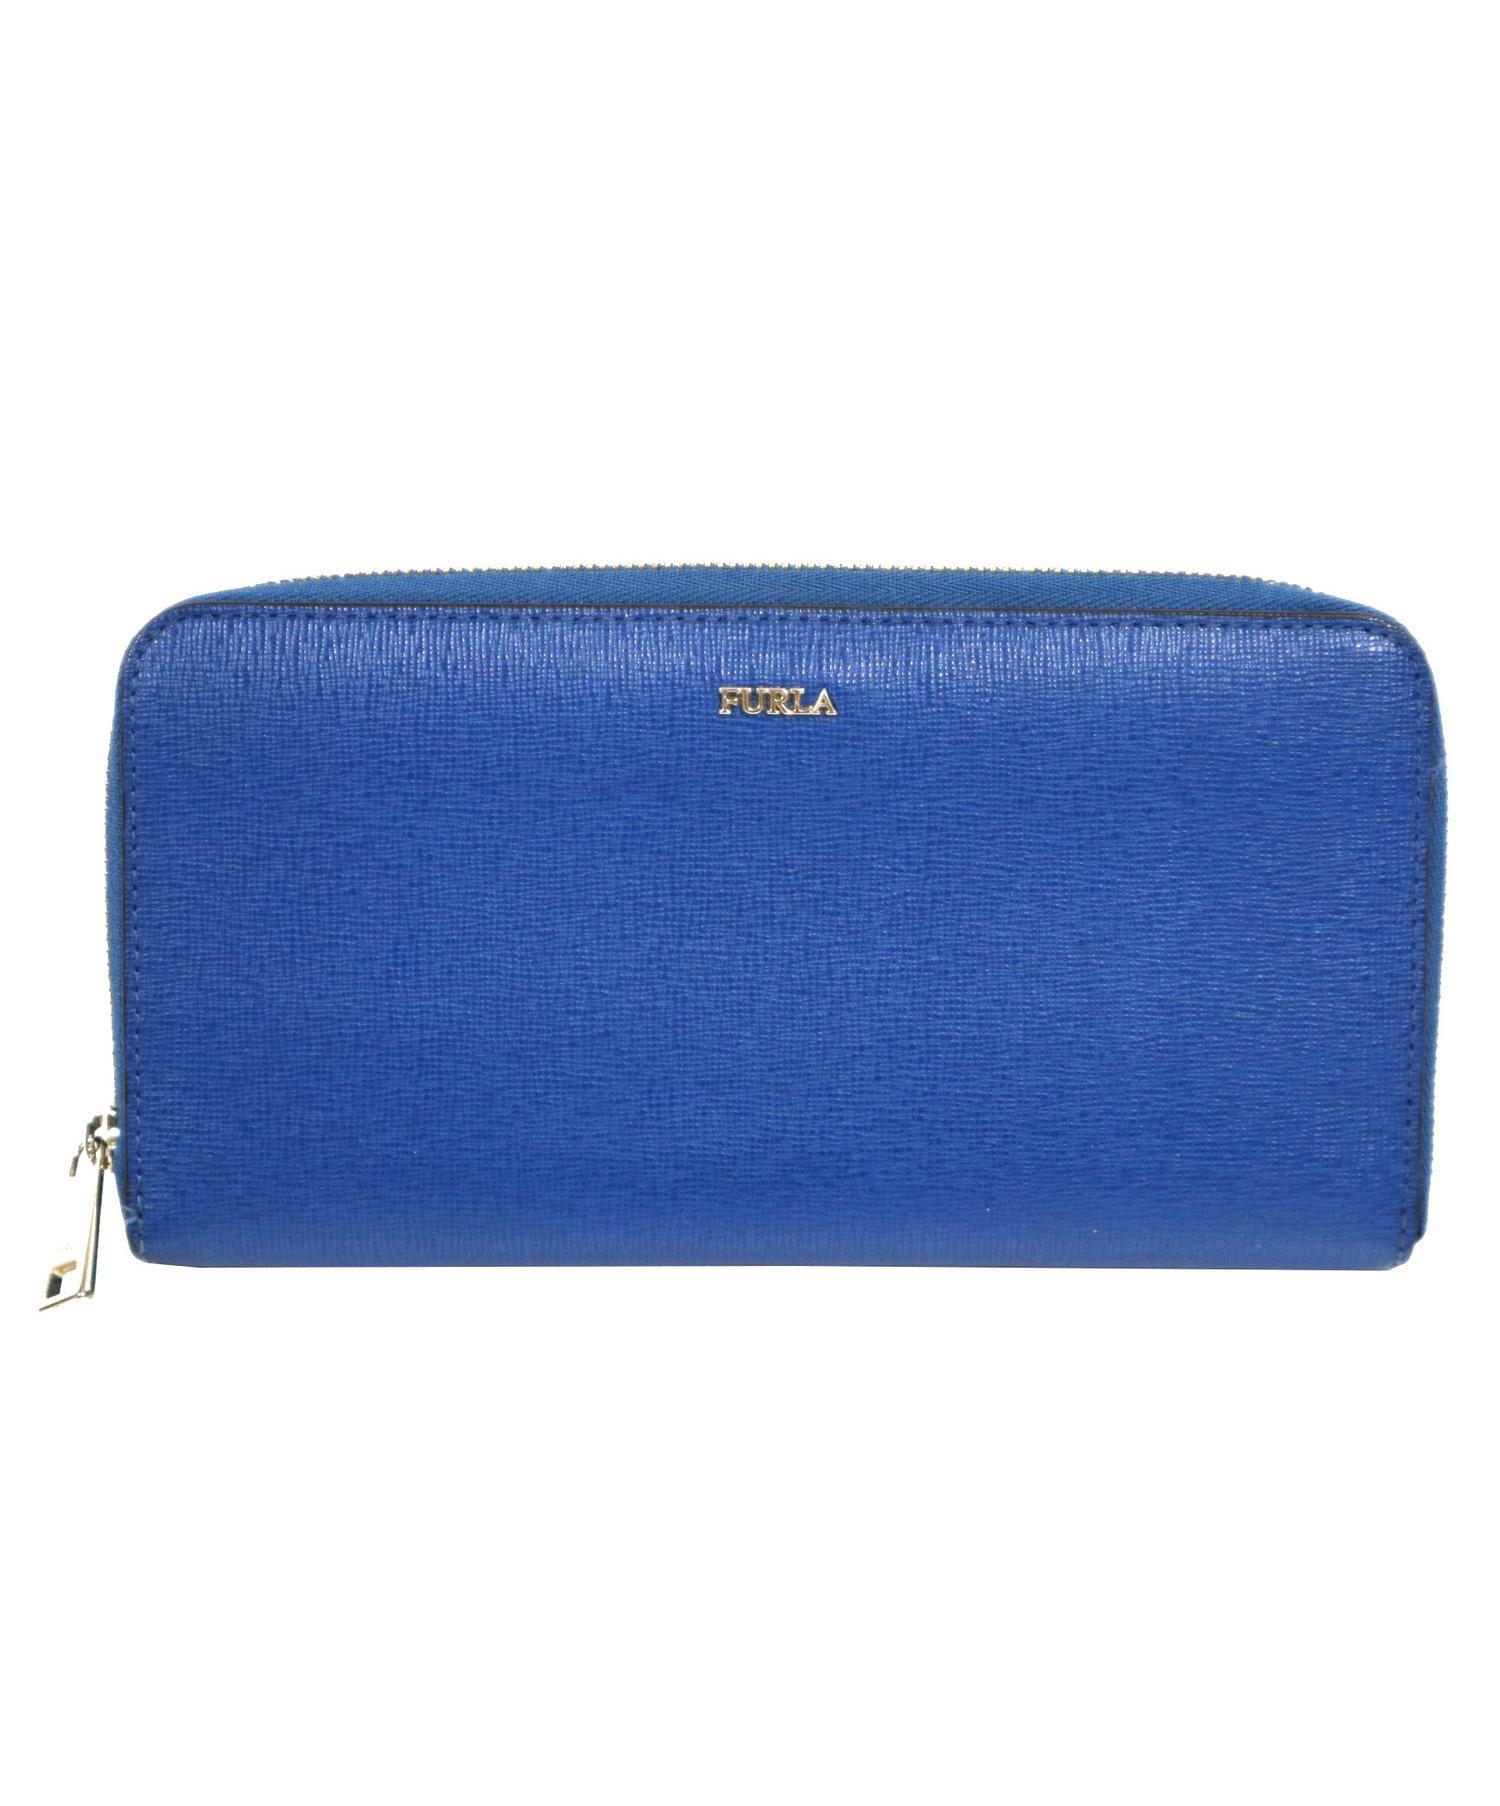 newest c4d05 0264e [中古]FURLA(フルラ)のレディース 服飾小物 長財布